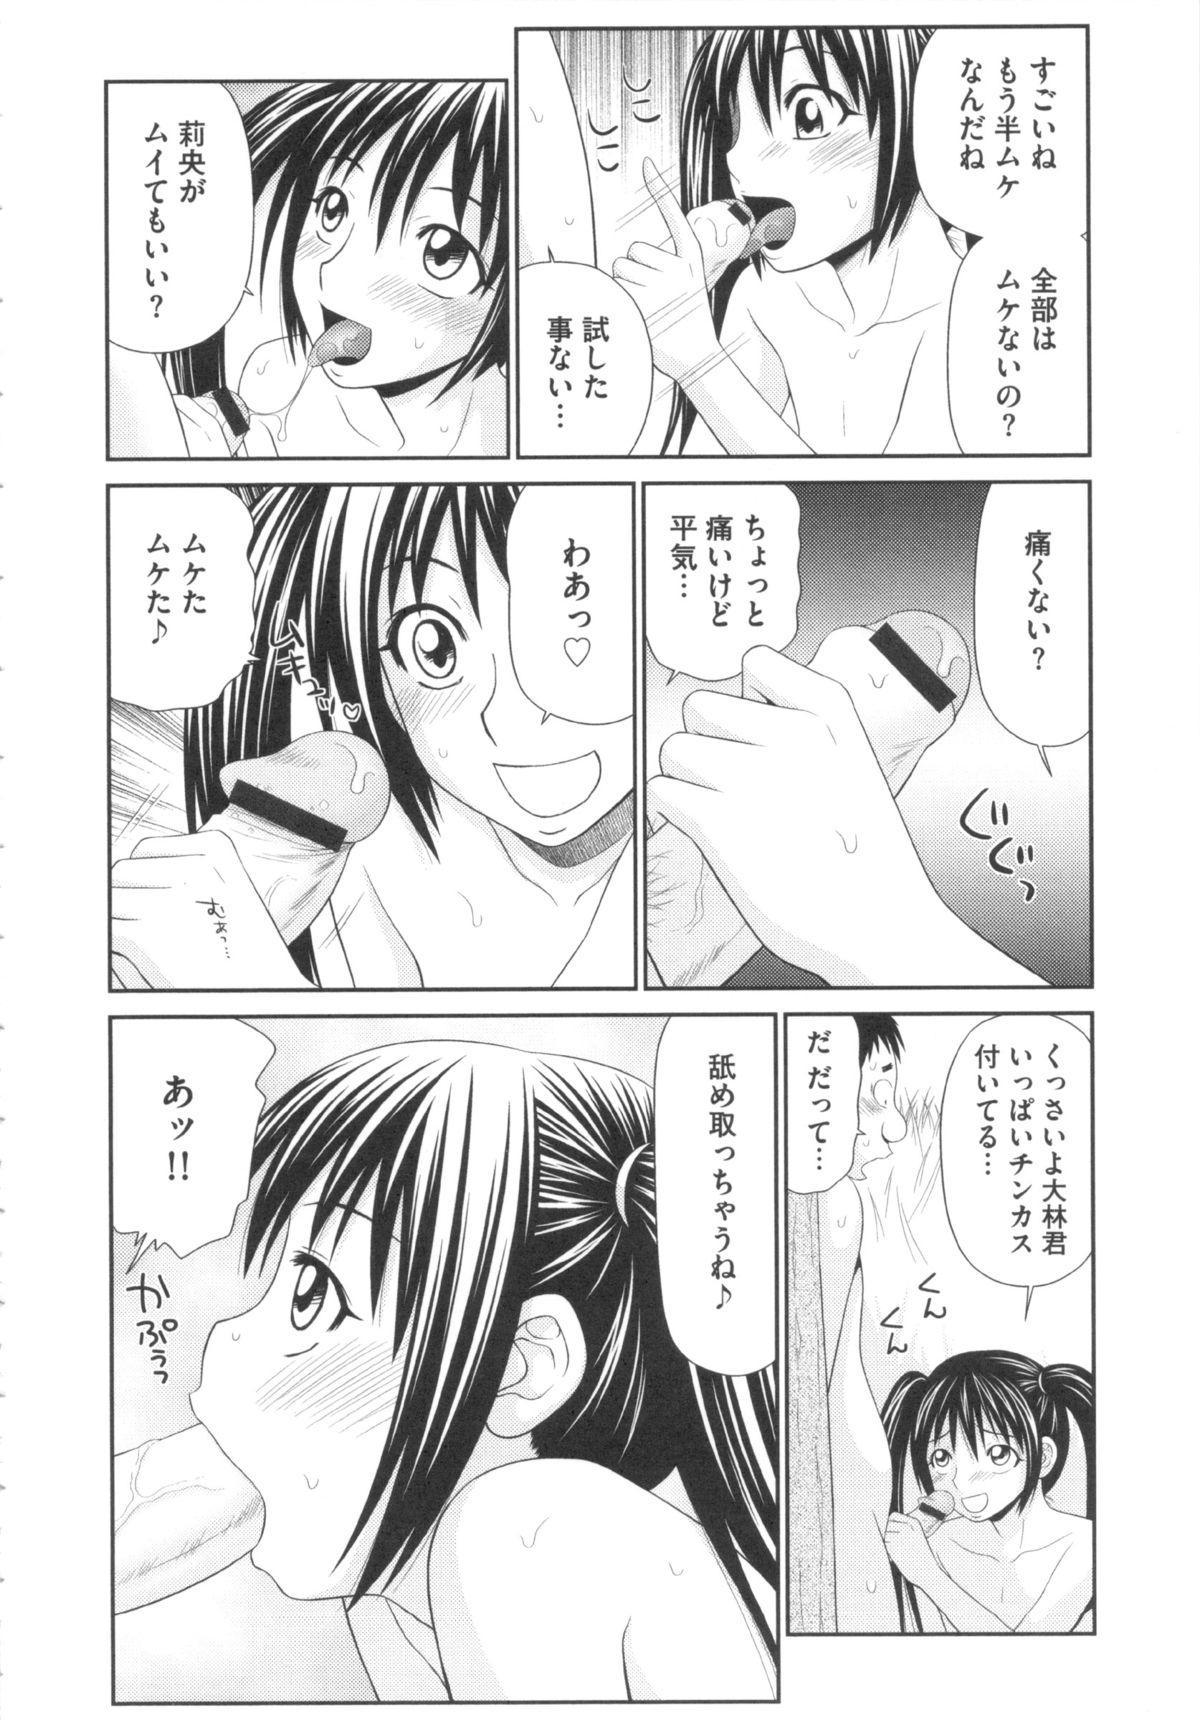 Kiseki No Zaajiru - Sperm of Miracle 134